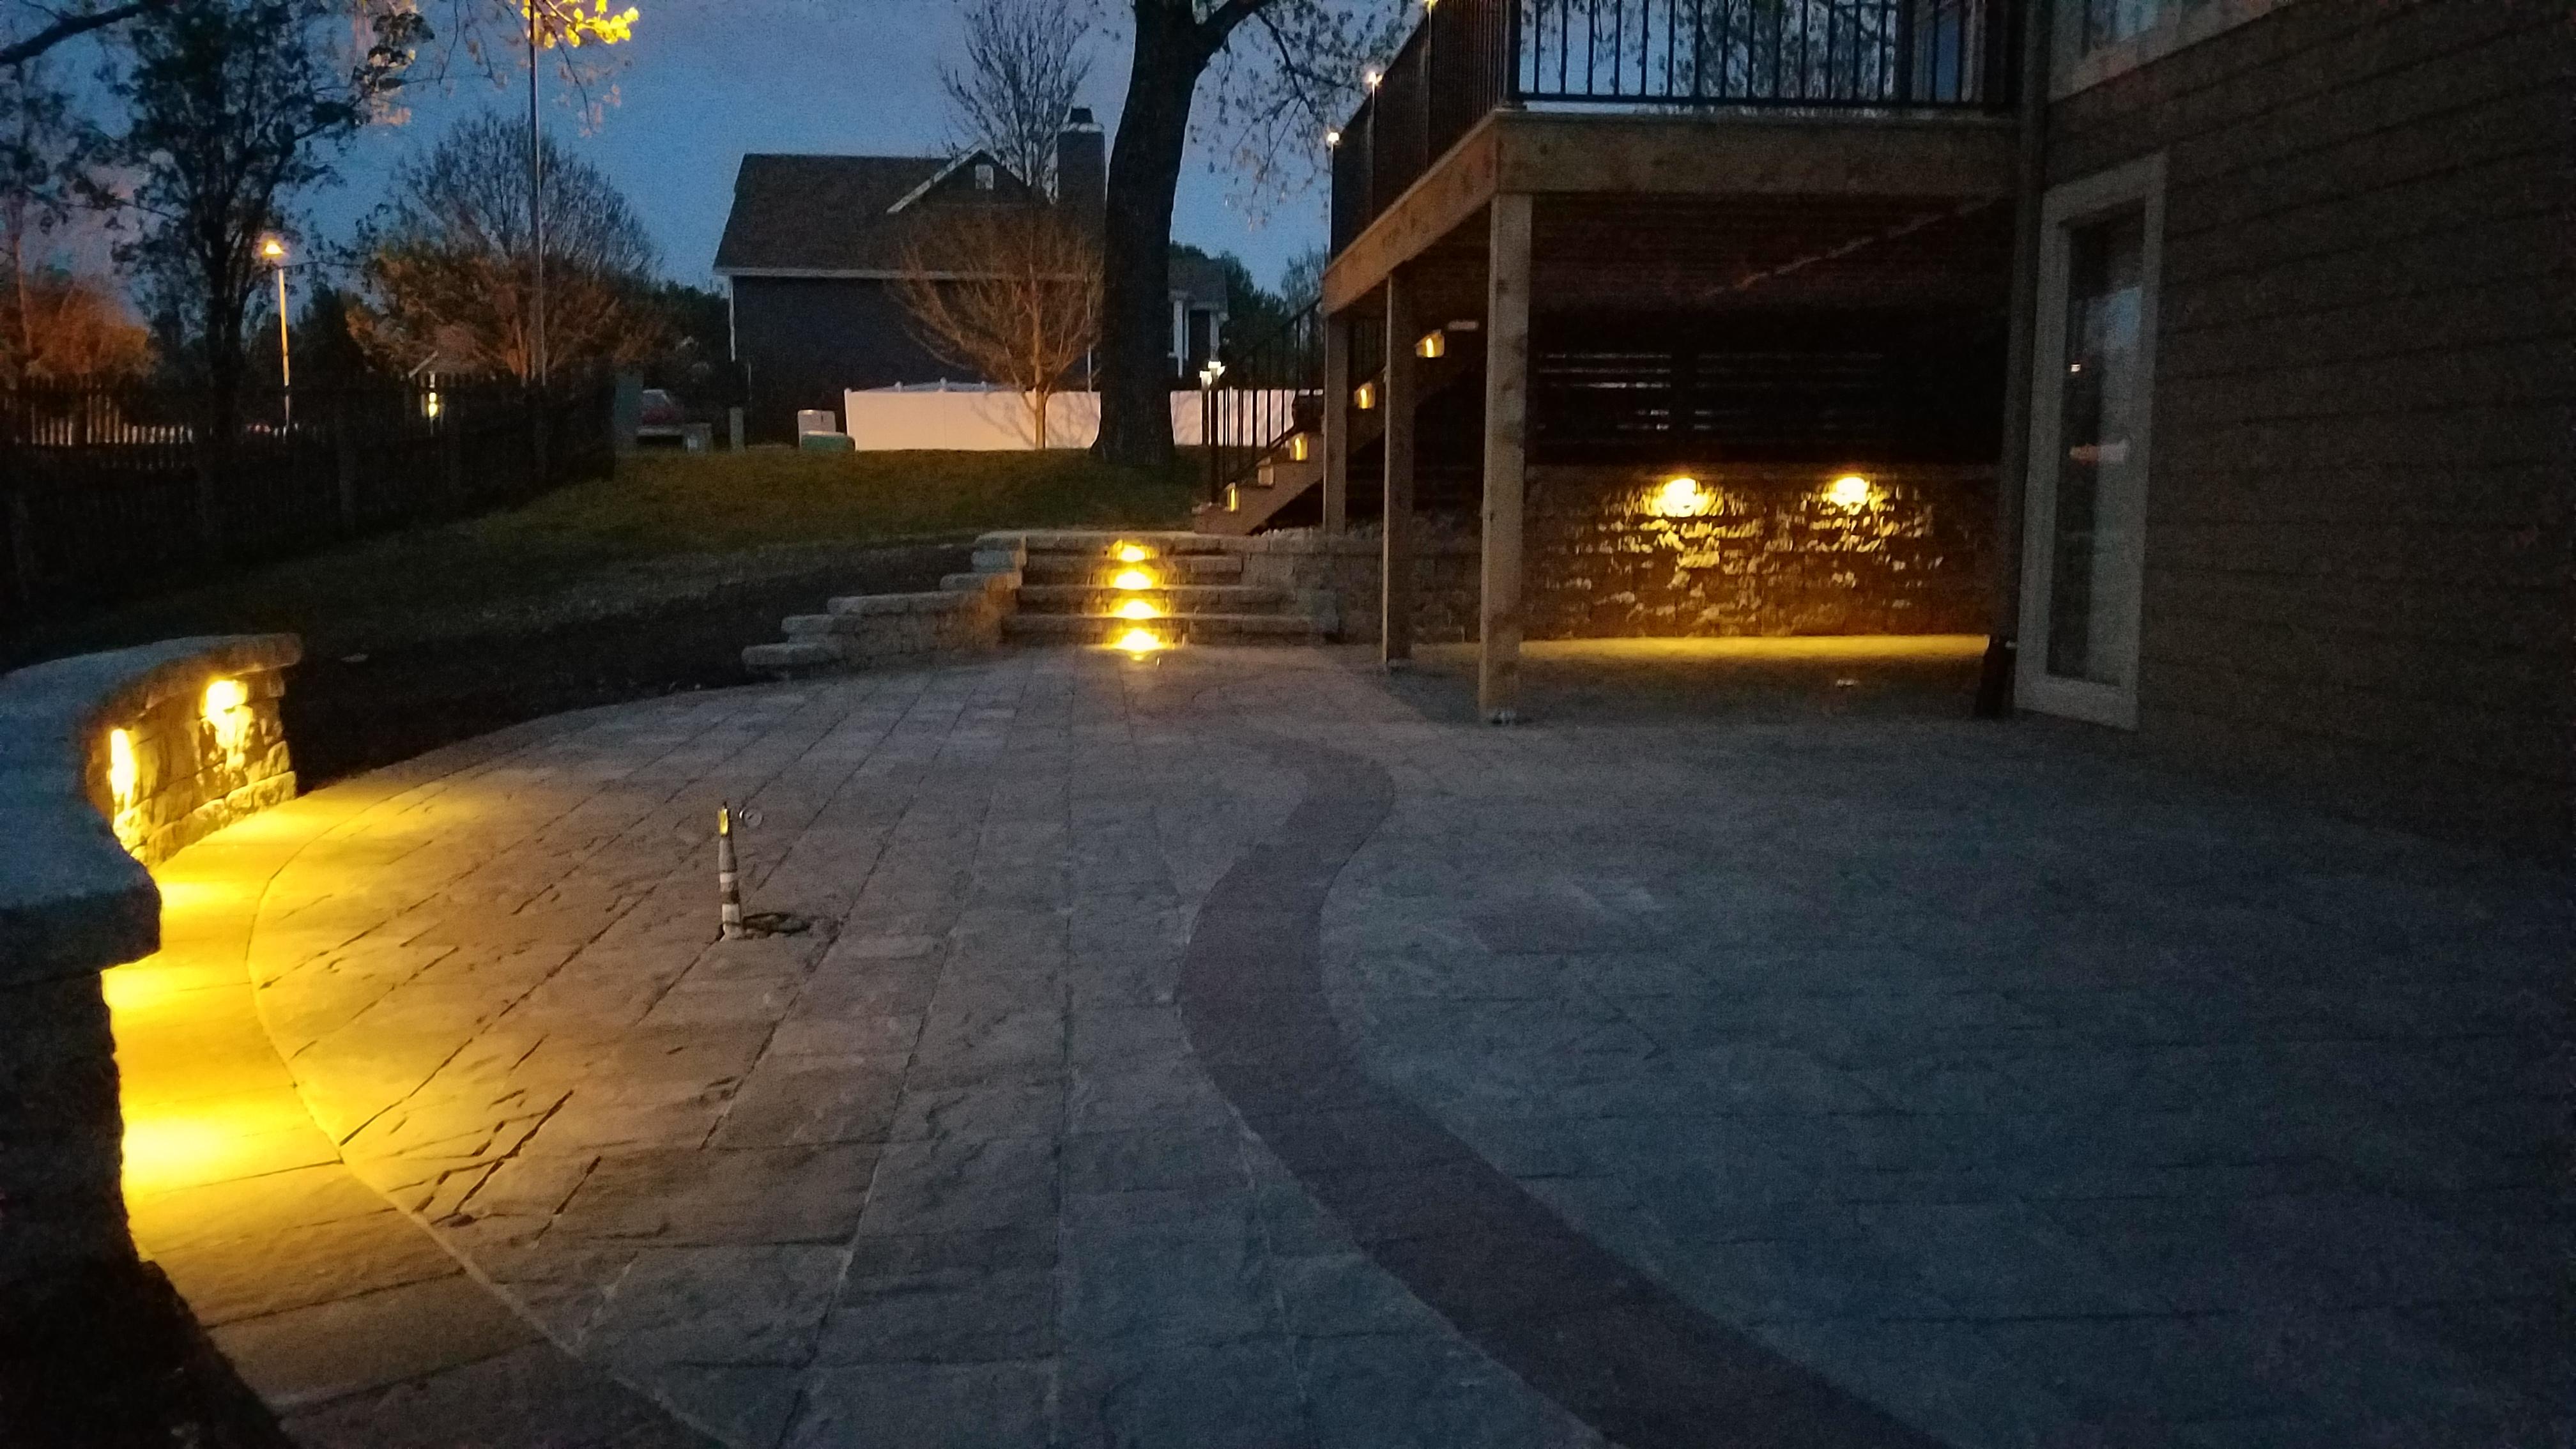 Mahan lights